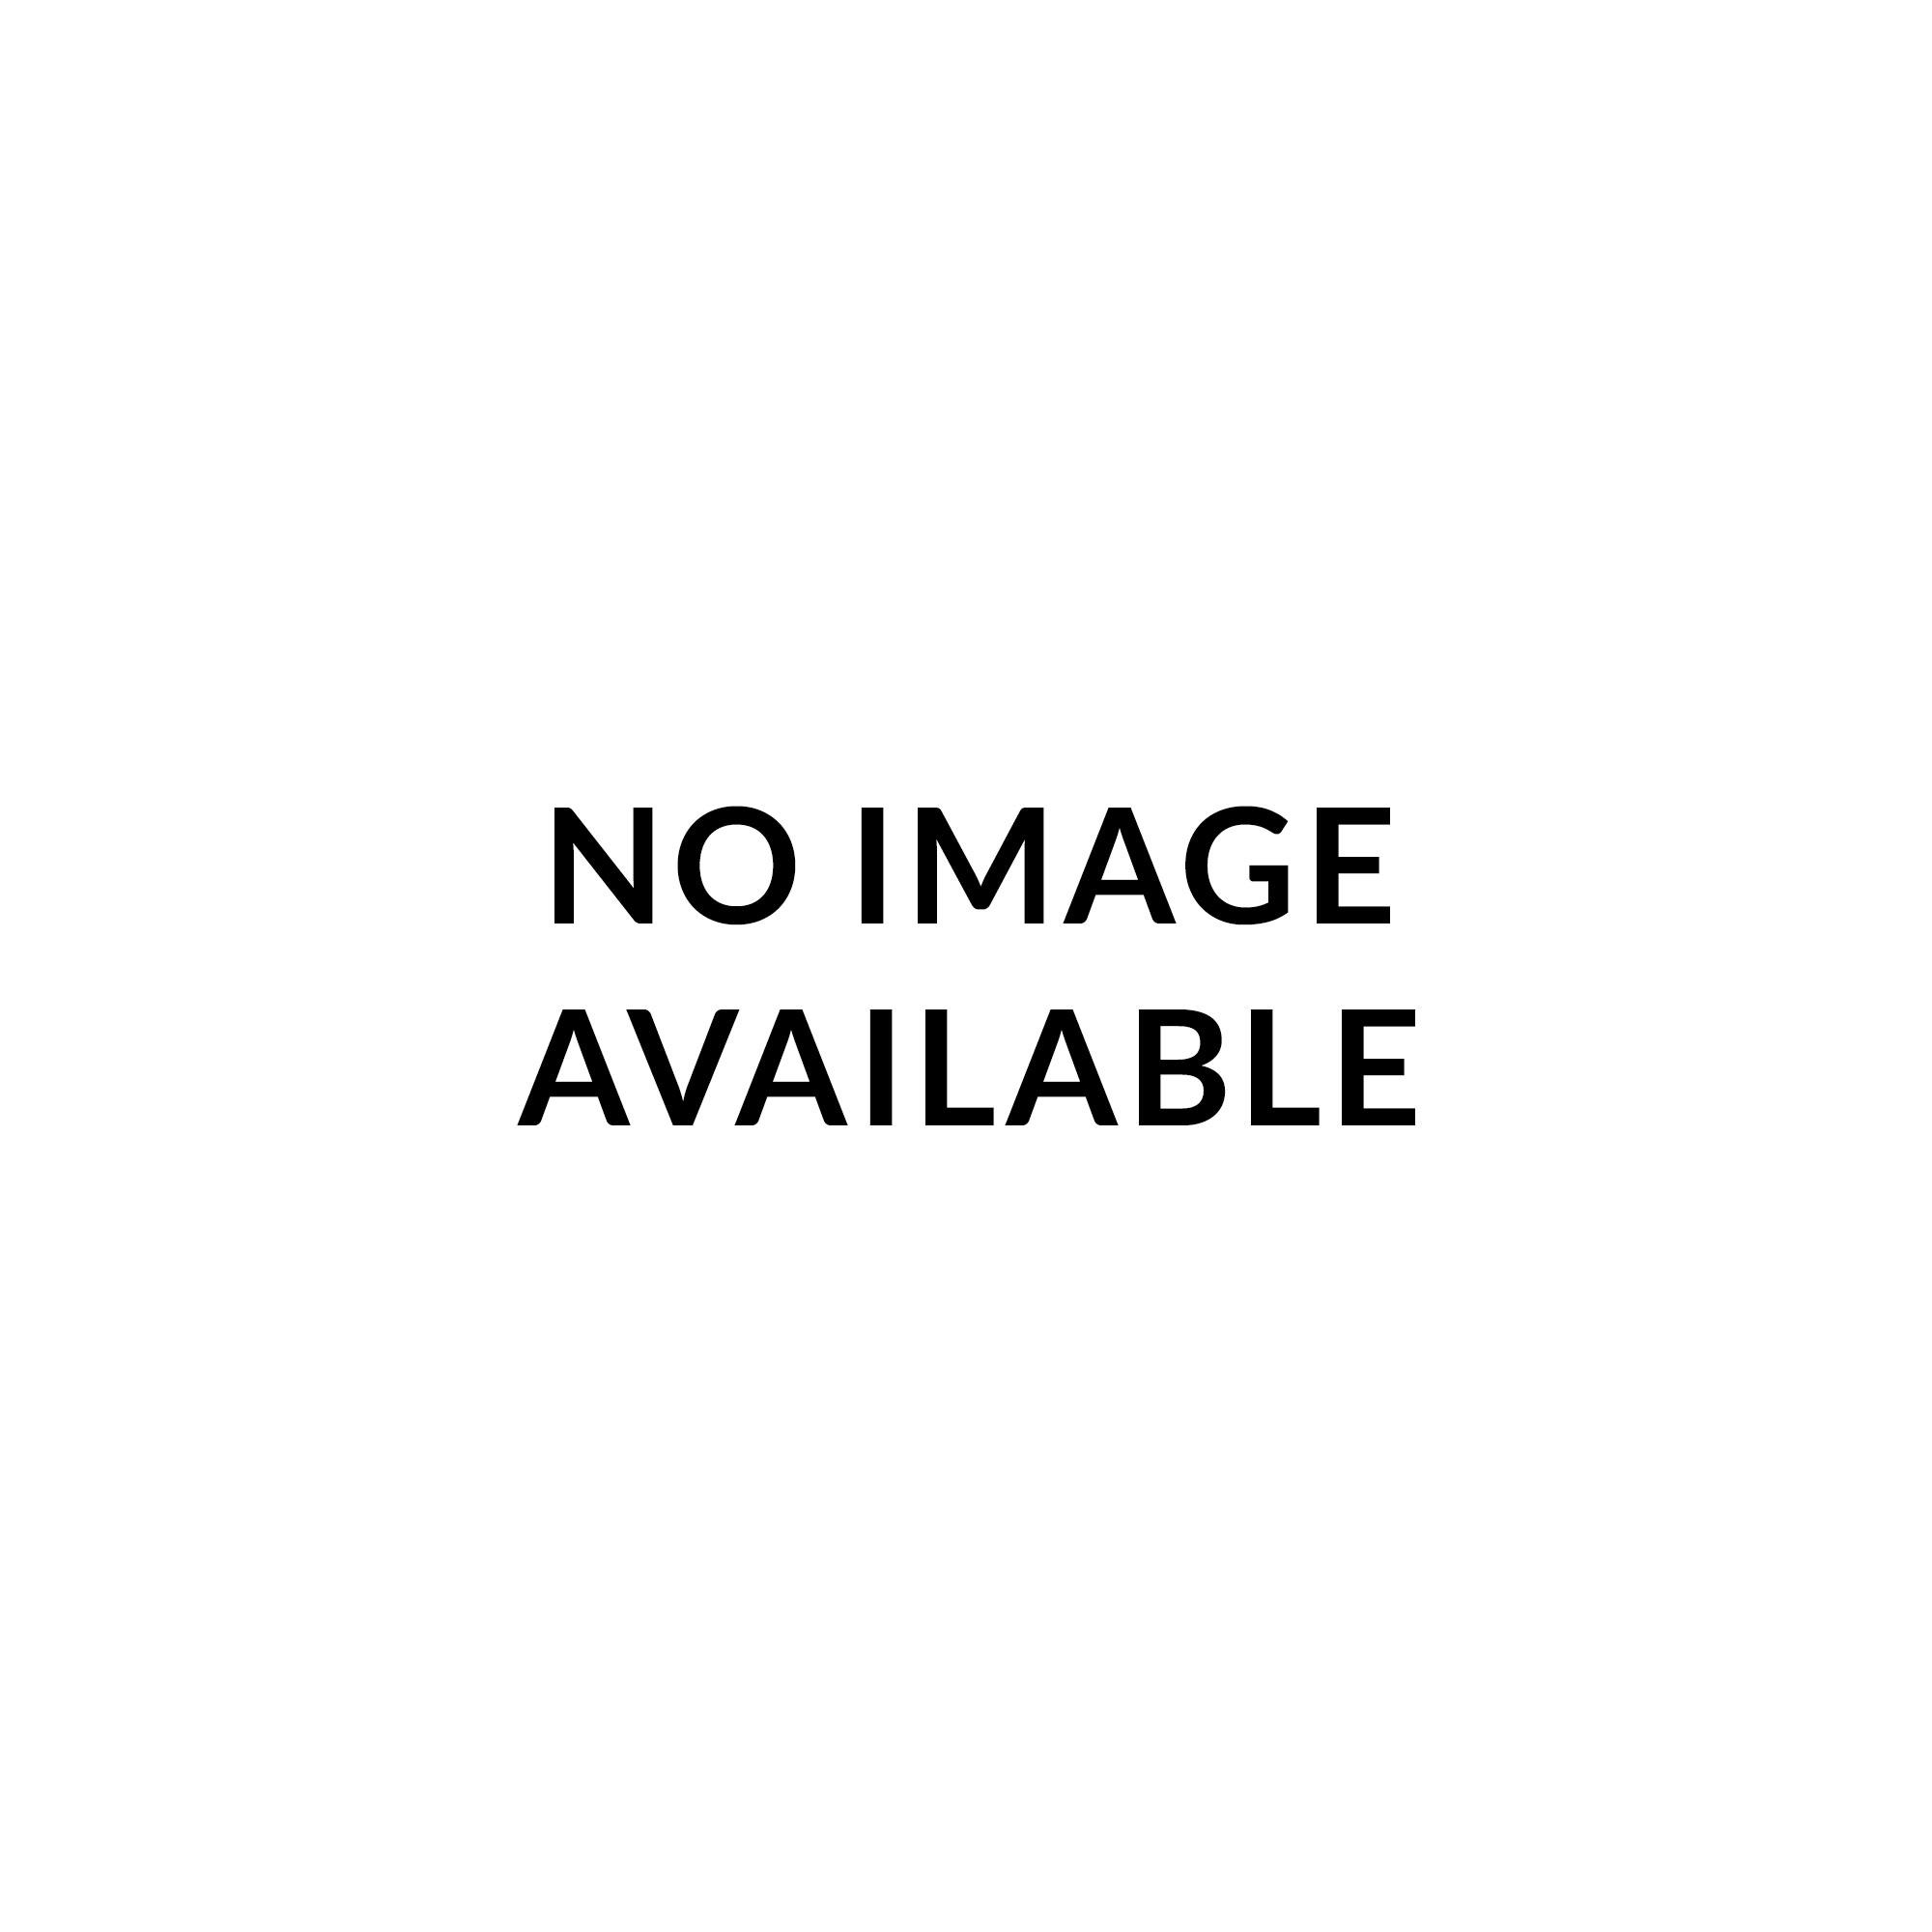 D'Addario XB105SL Nickel Wound XL Bass Single String .105 Super Long Scale